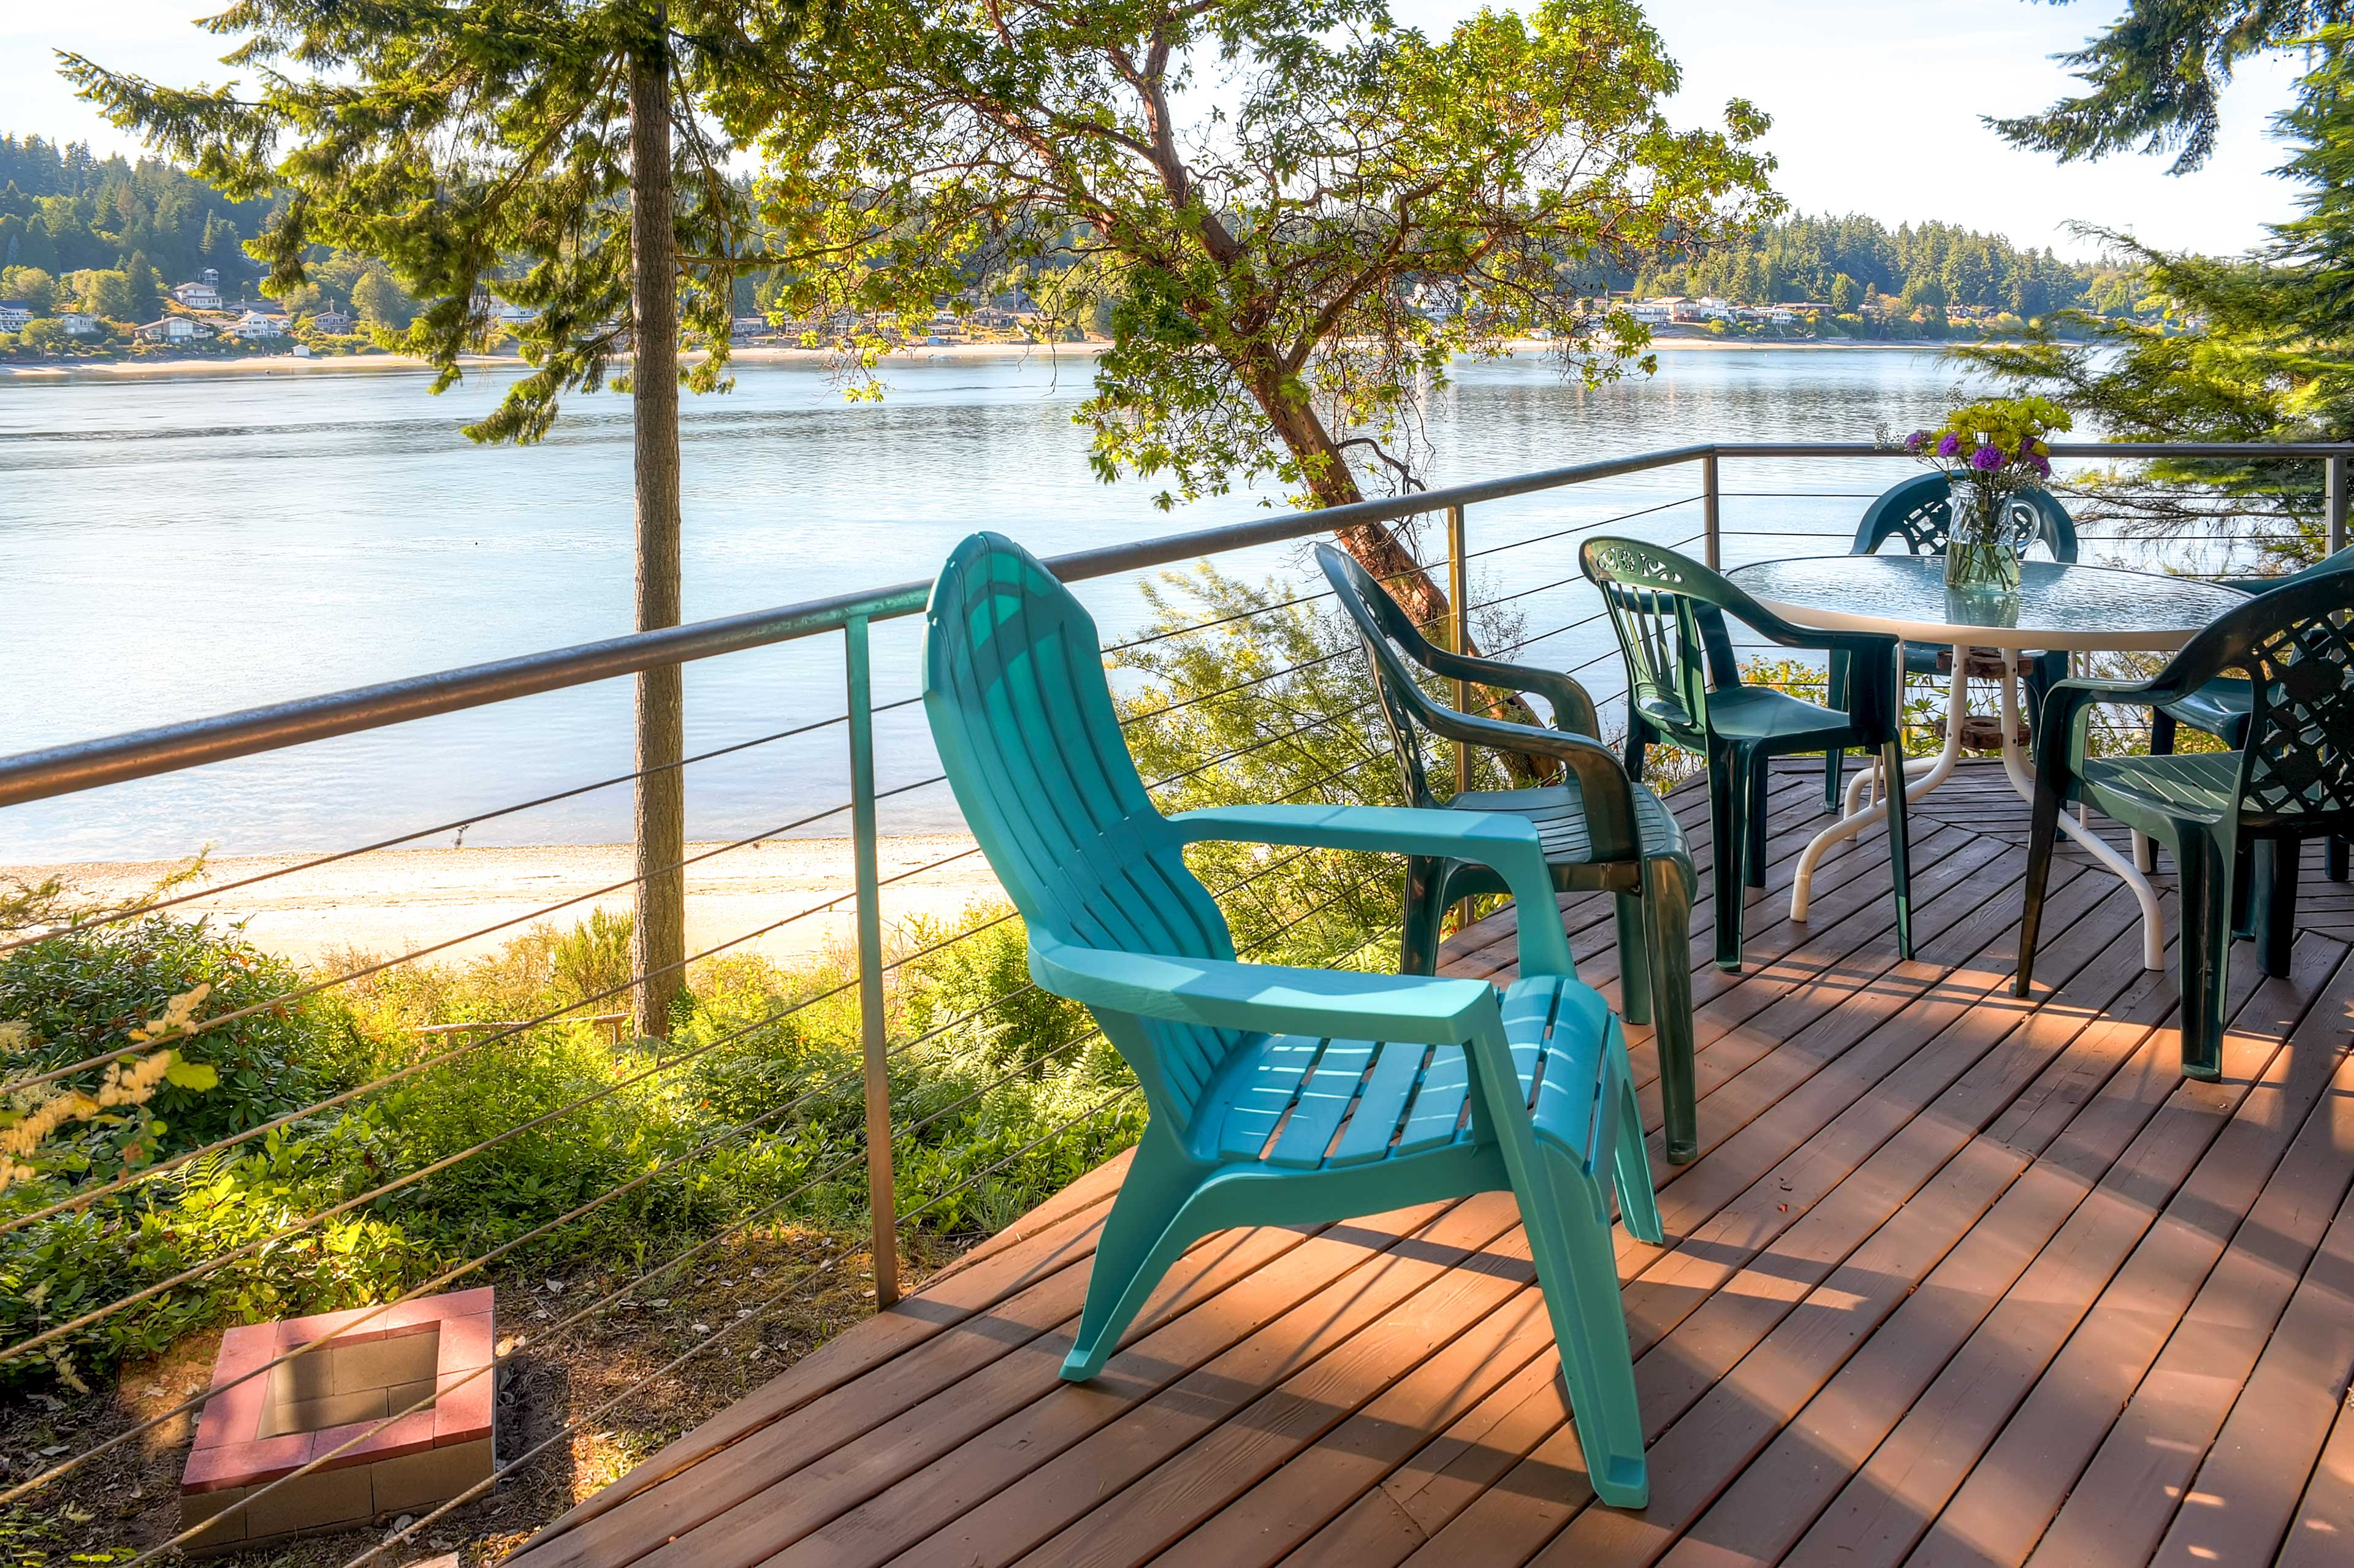 Bainbridge Island Vacation Rental | 2-Story Home | 4BR | 3BA | 2,700 Sq Ft